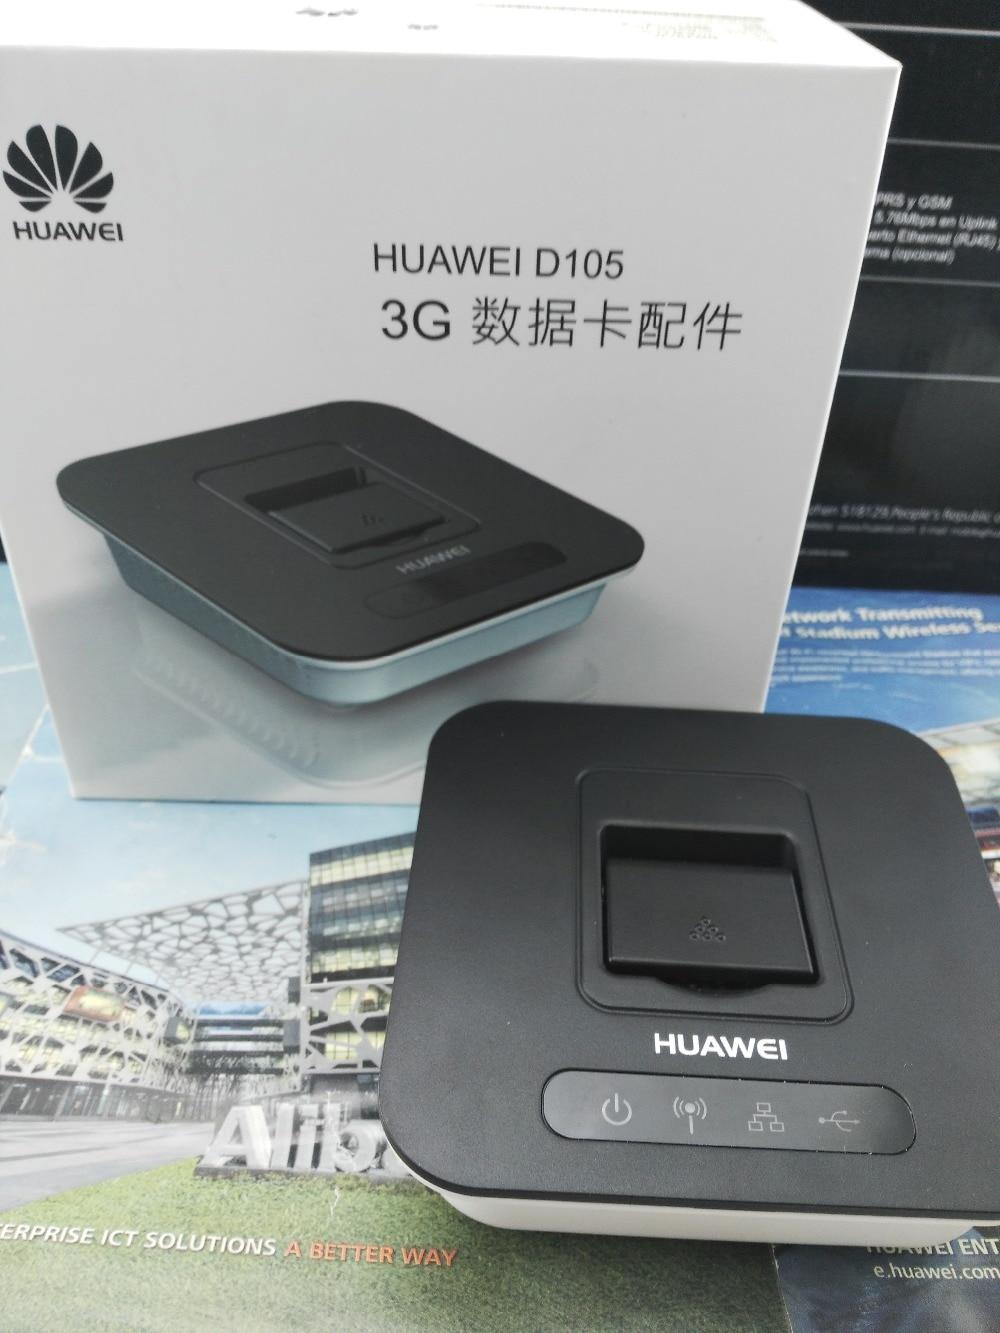 ФОТО Huawei D105 3g Wireless Router transforms USB 3G E1831 E220 E173 E160 E169 E172 e180 Modem/dongle into WiFi network